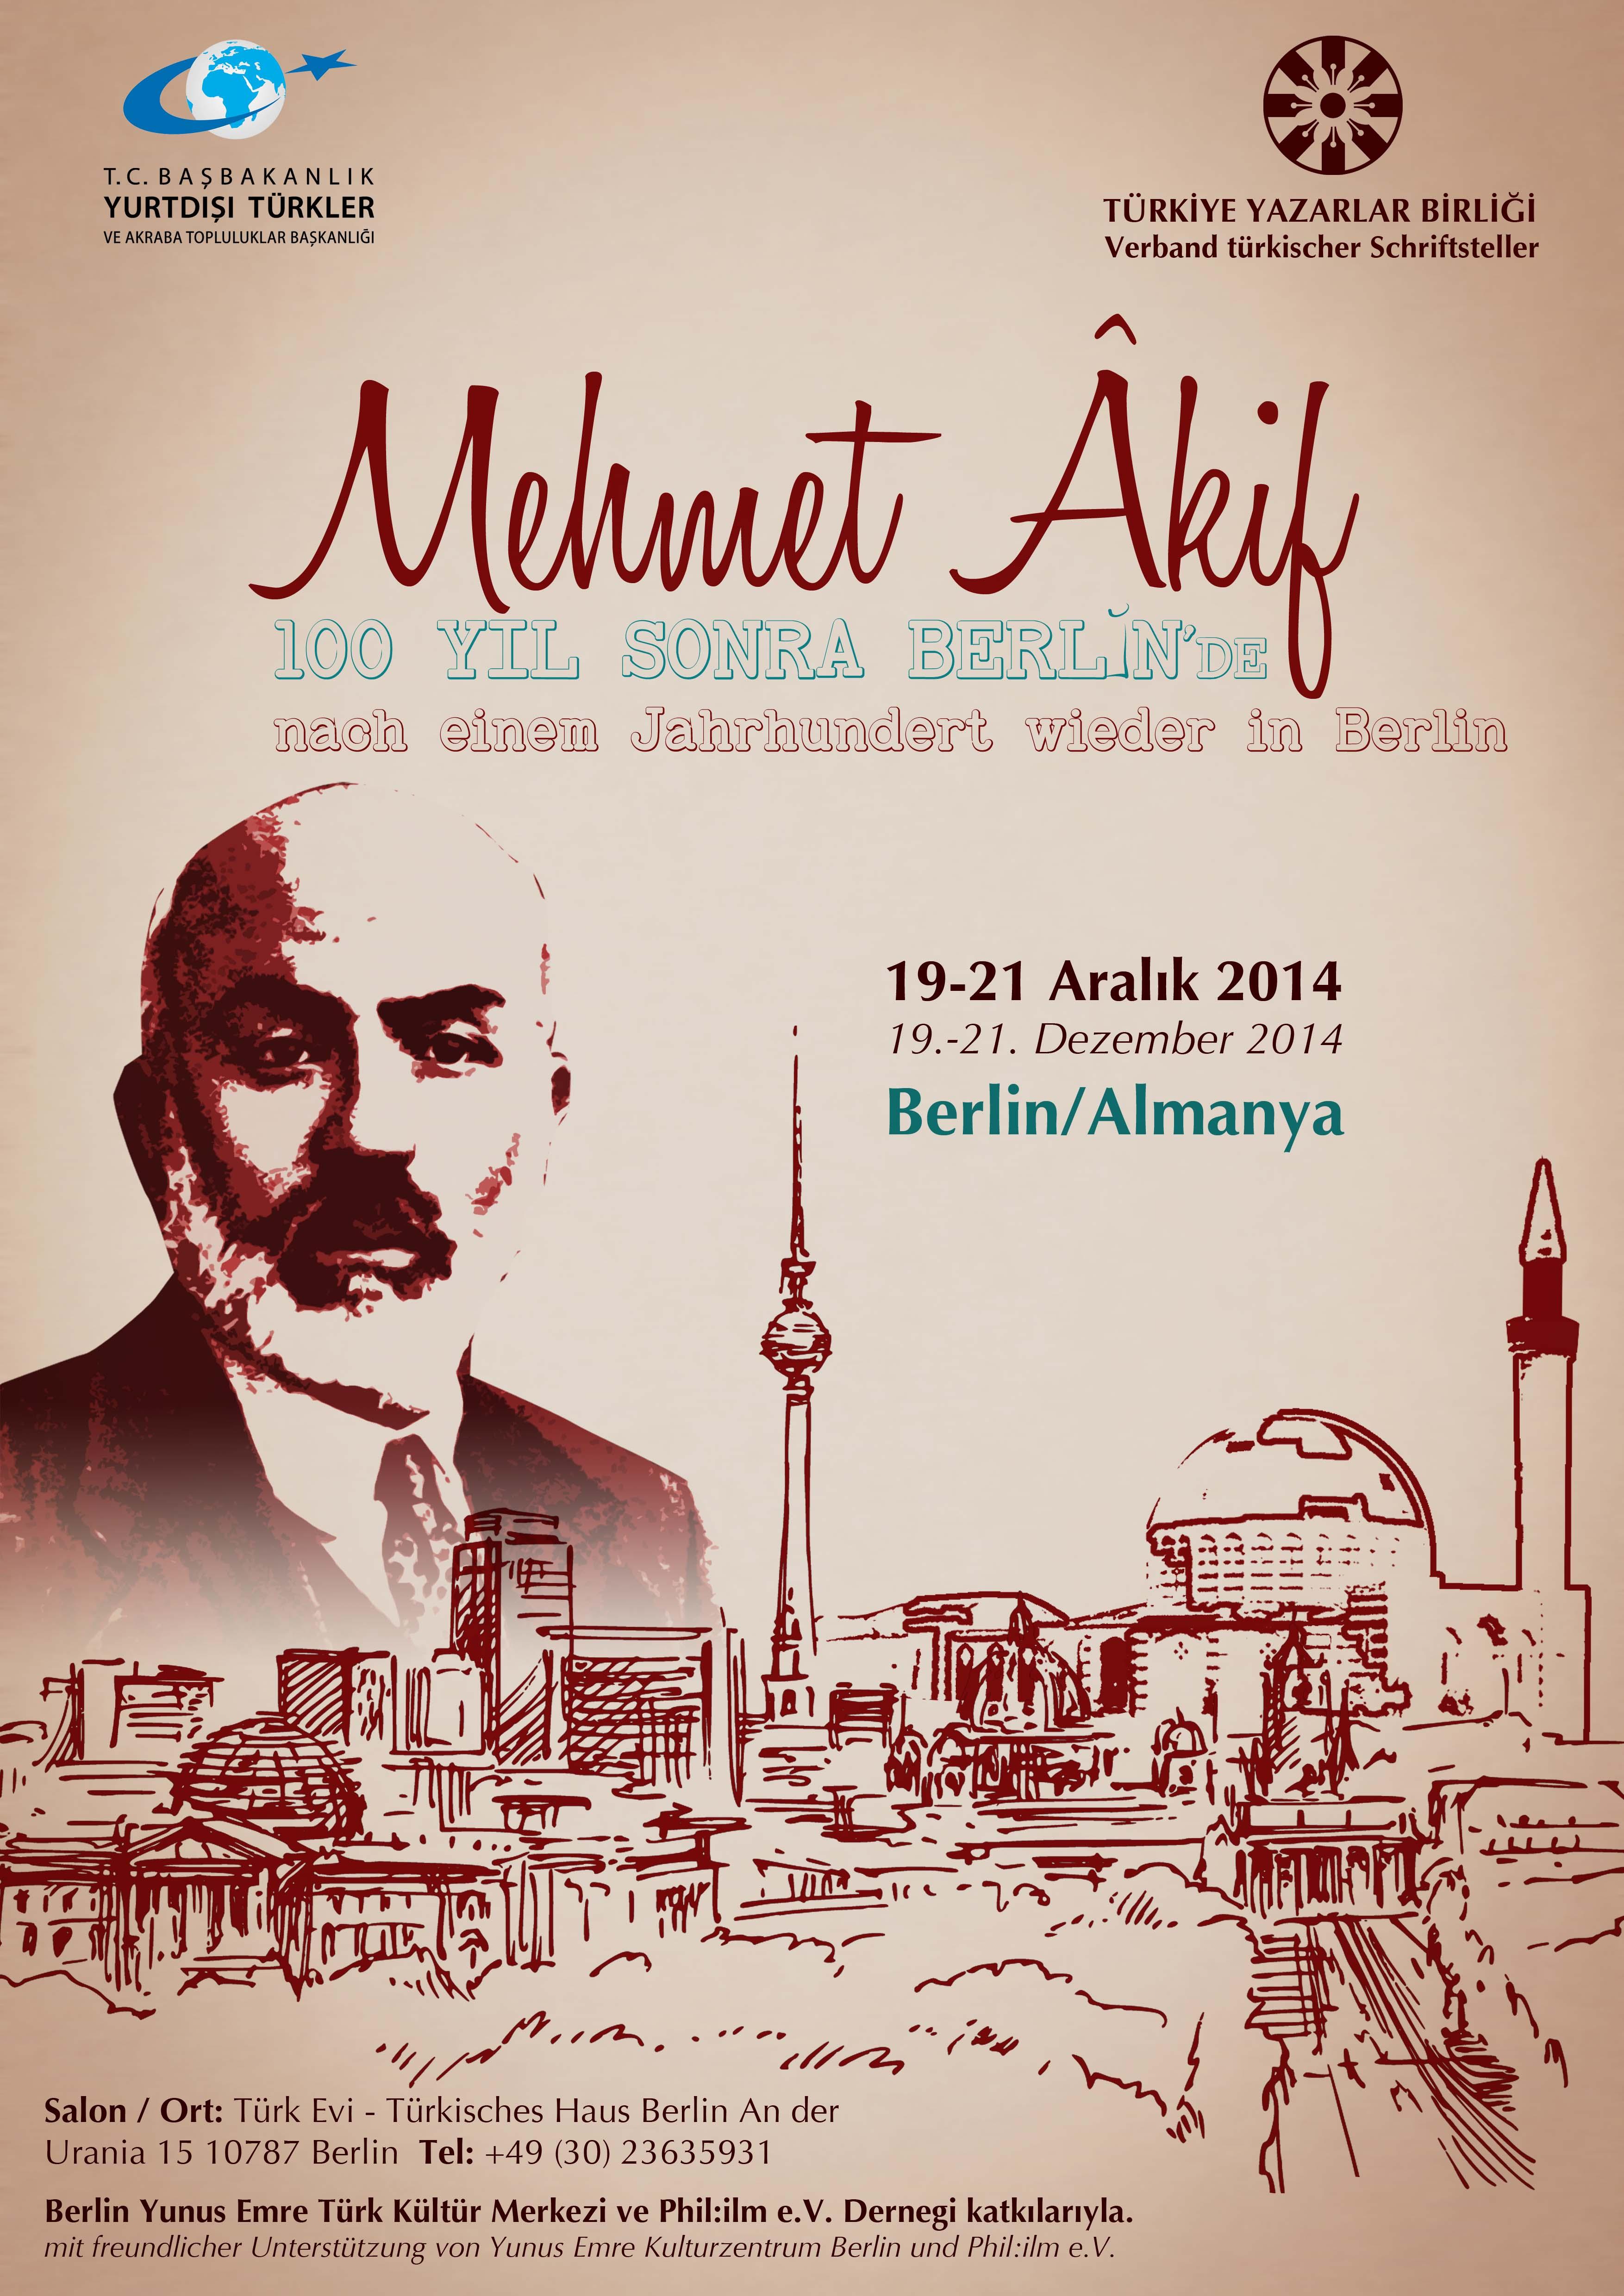 Mehmet Âkif 100 yıl sonra Berlin'de!